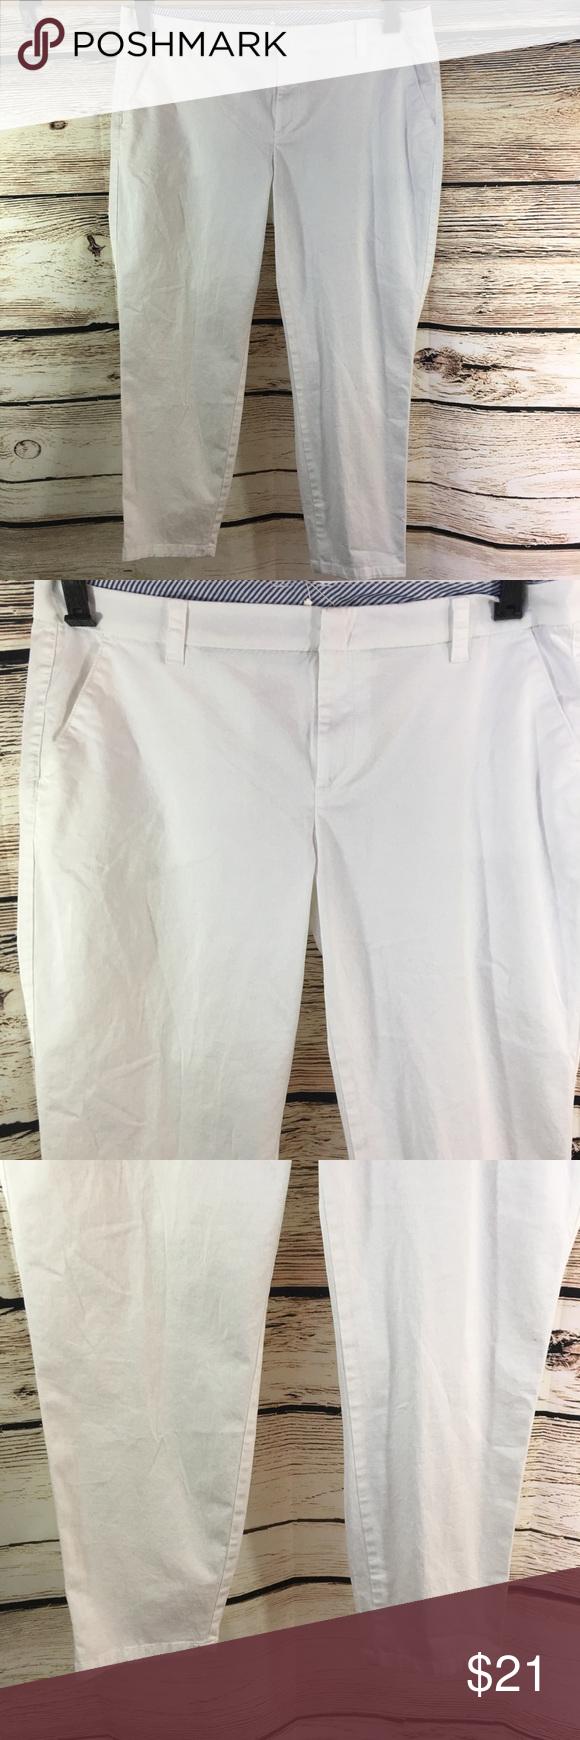 311d30b839c87 NWT JCPenny size 16W white Capri Pants New Capri style pants Cotton spandex jcpenney  Pants Ankle   Cropped